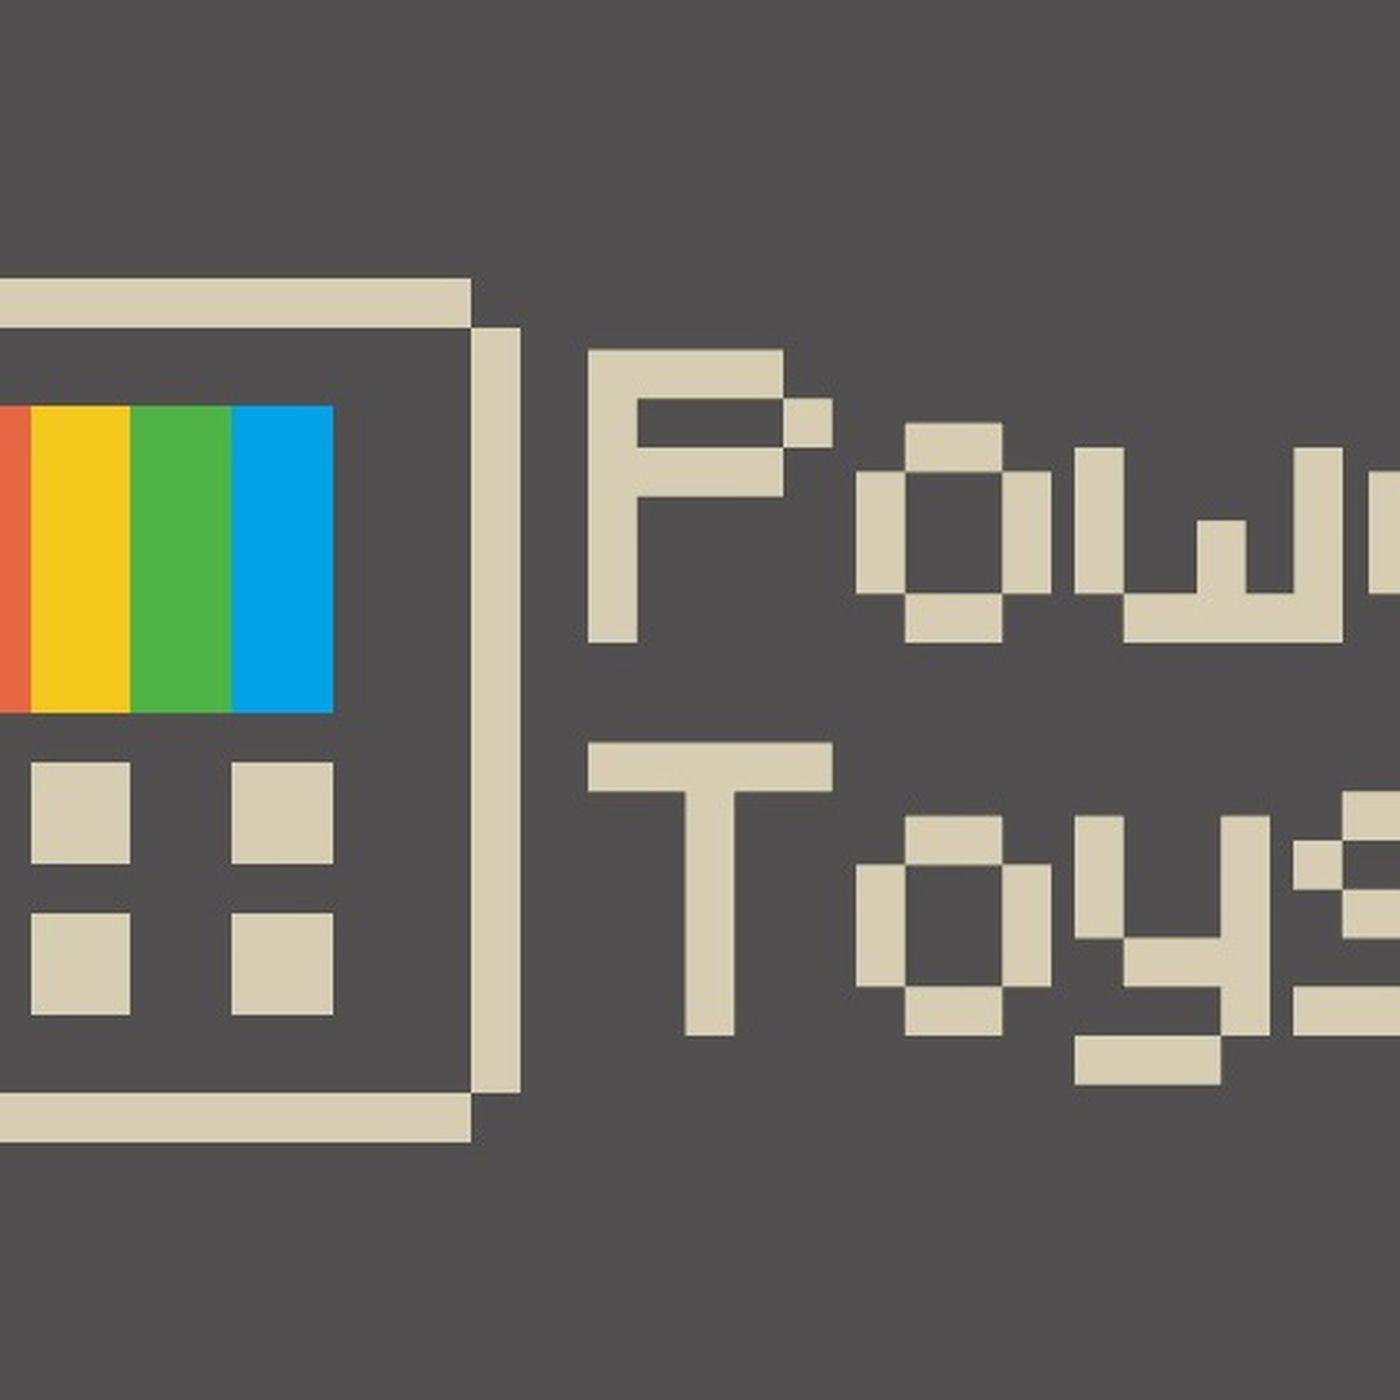 Microsoft brings PowerToys back to let anyone improve